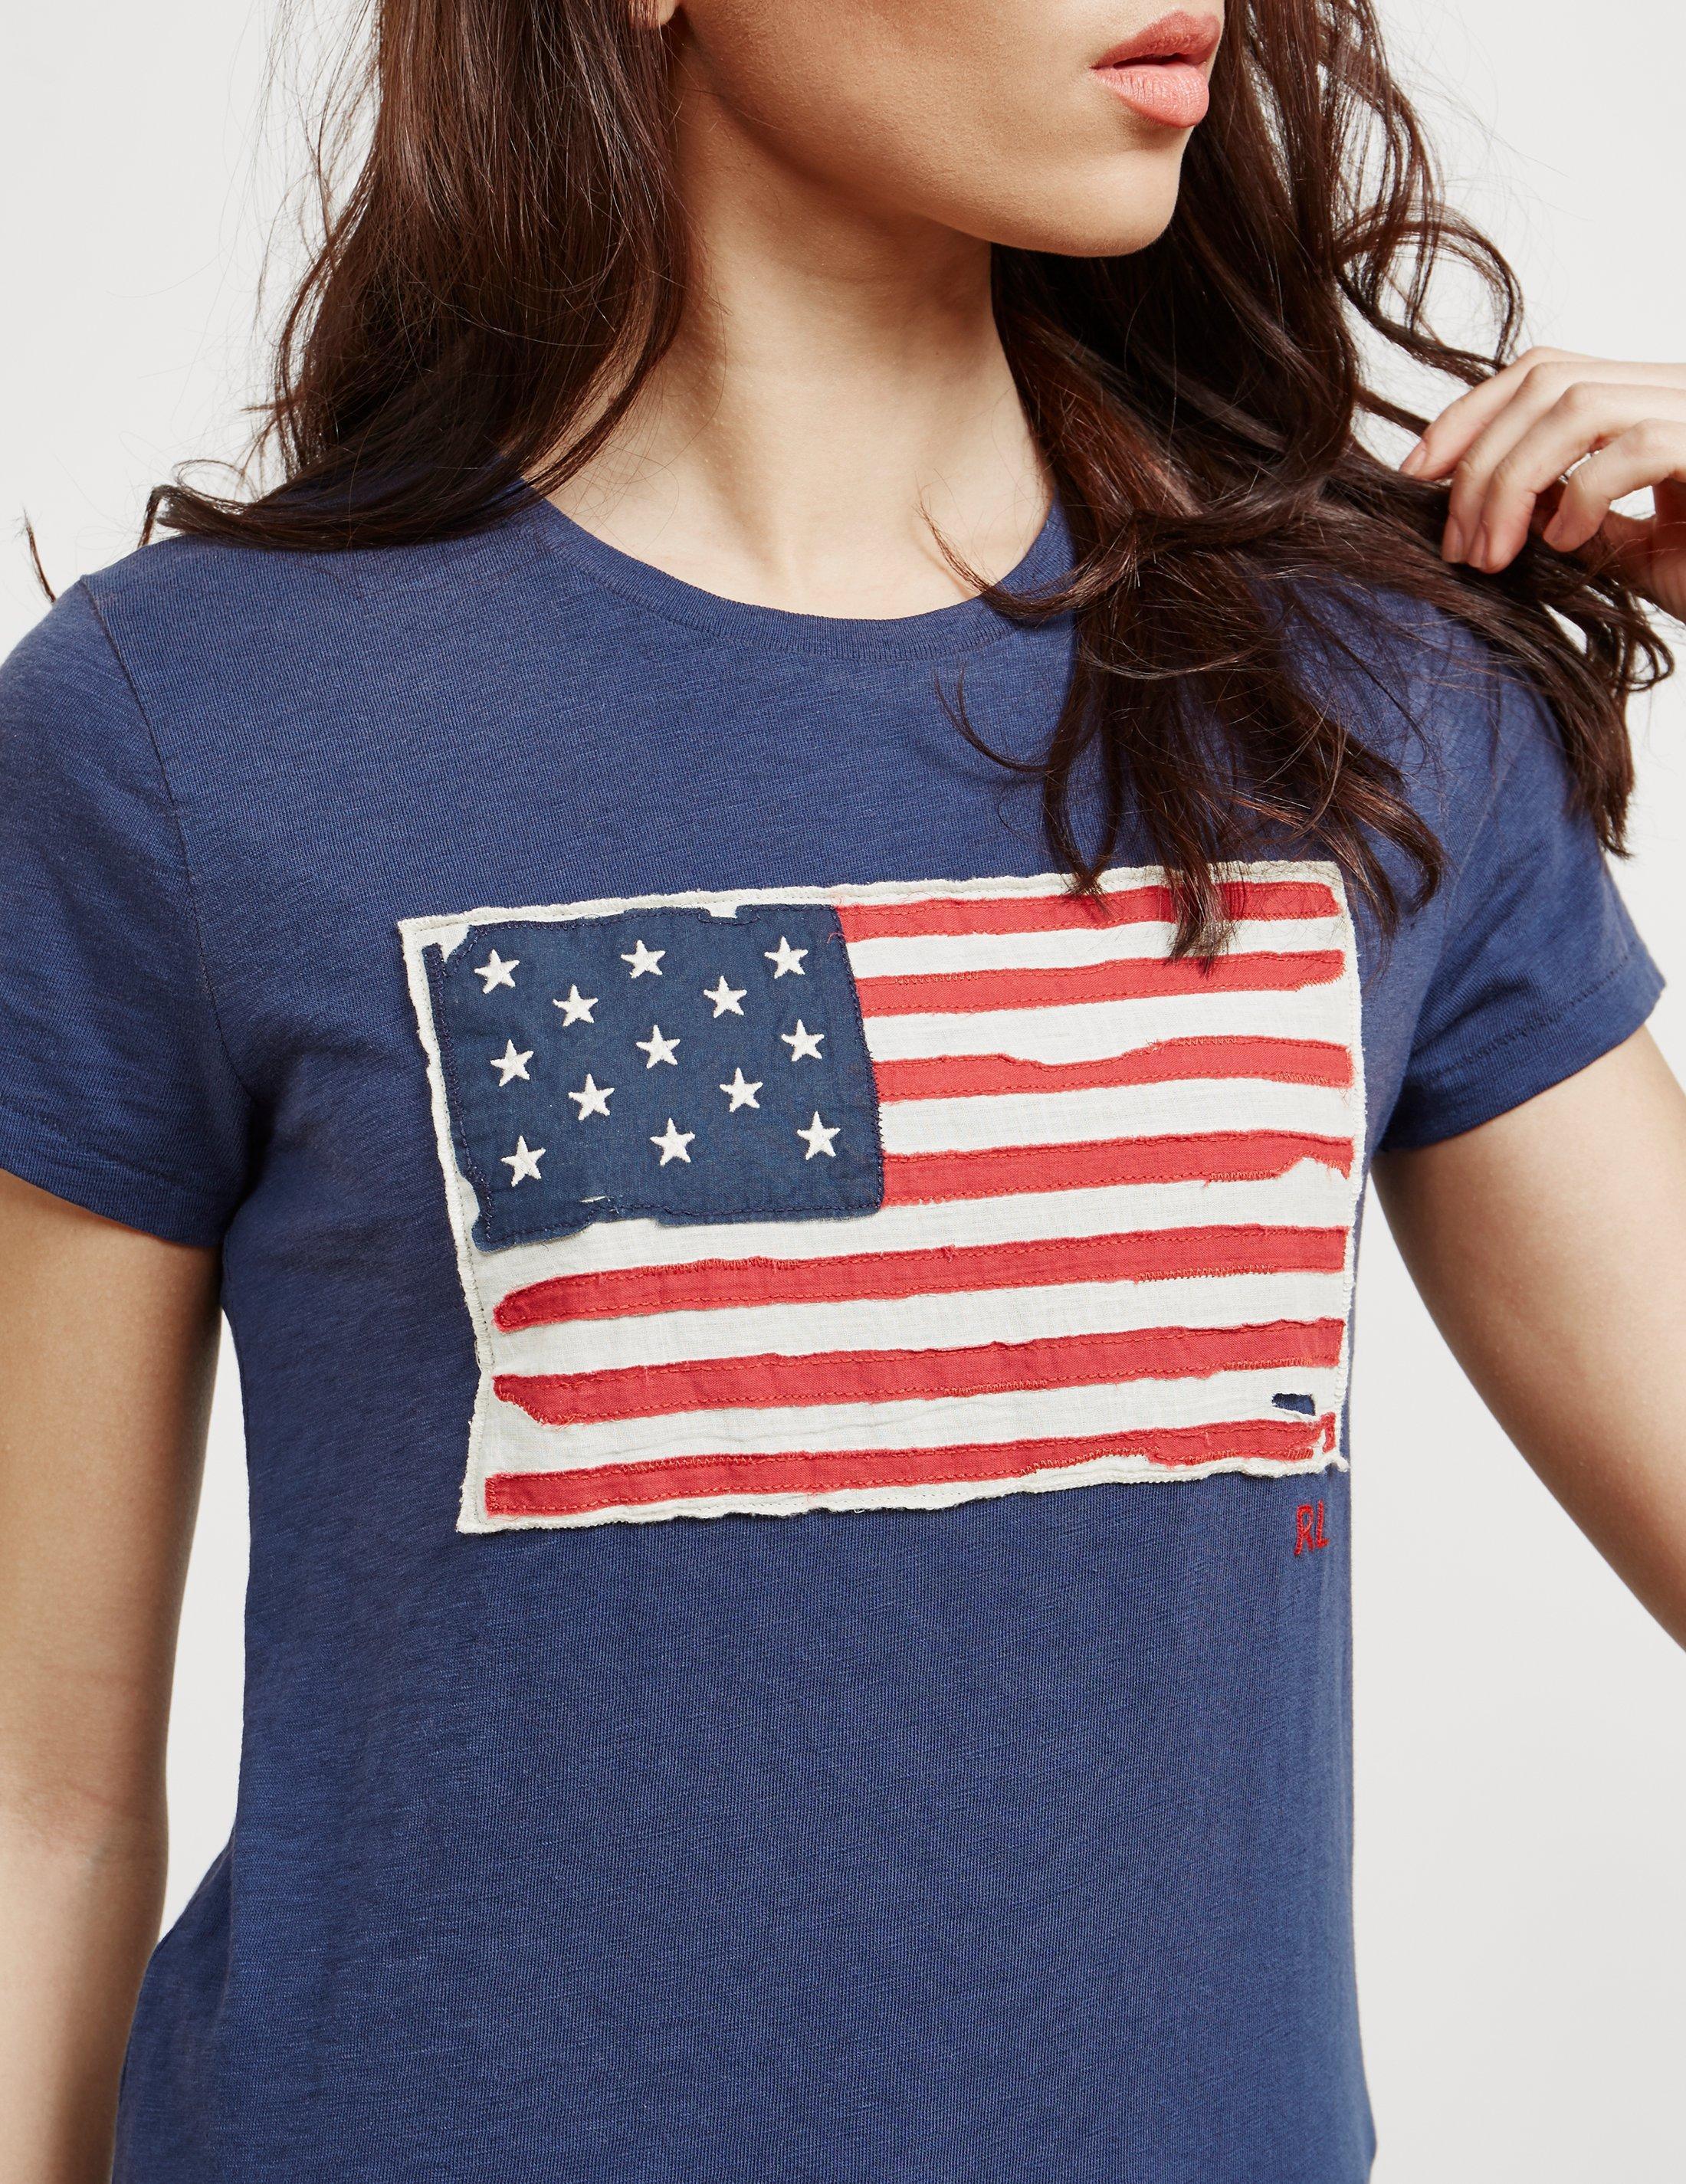 712dd895f5eed Lyst - Polo Ralph Lauren Flag Short Sleeve T-shirt Navy Blue in Blue